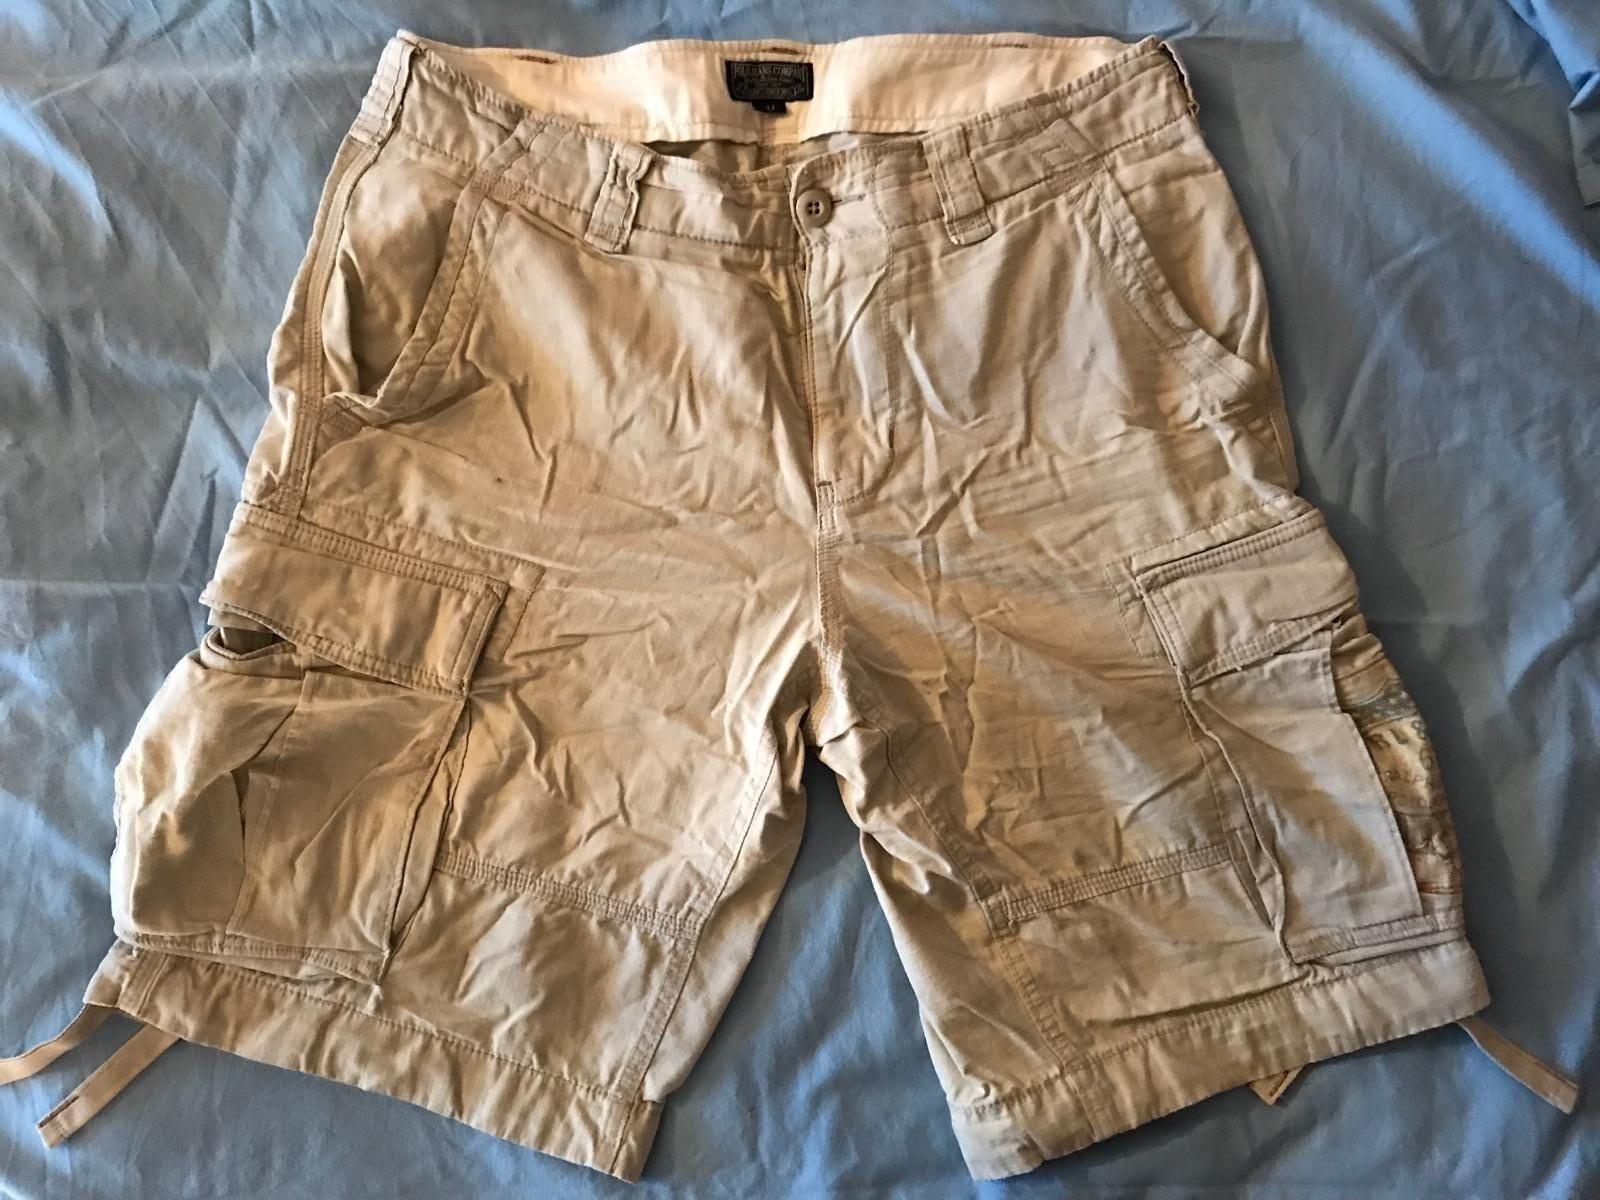 Ralph Lauren, Polo Jeans Company, shorts, herr (347955889